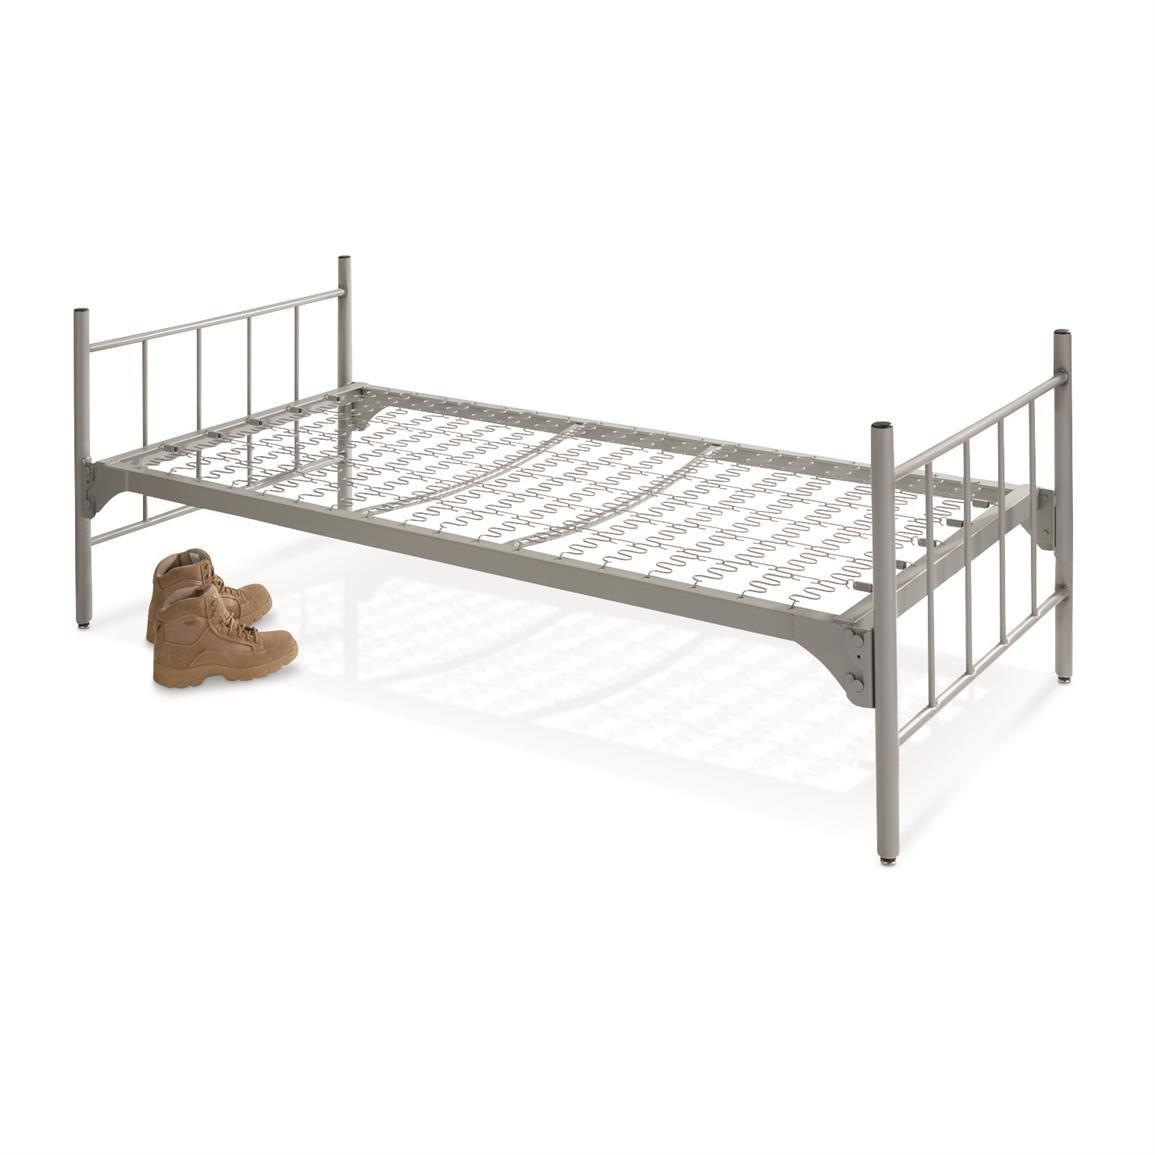 U S Military Surplus Steel Bed New Othello Pinterest